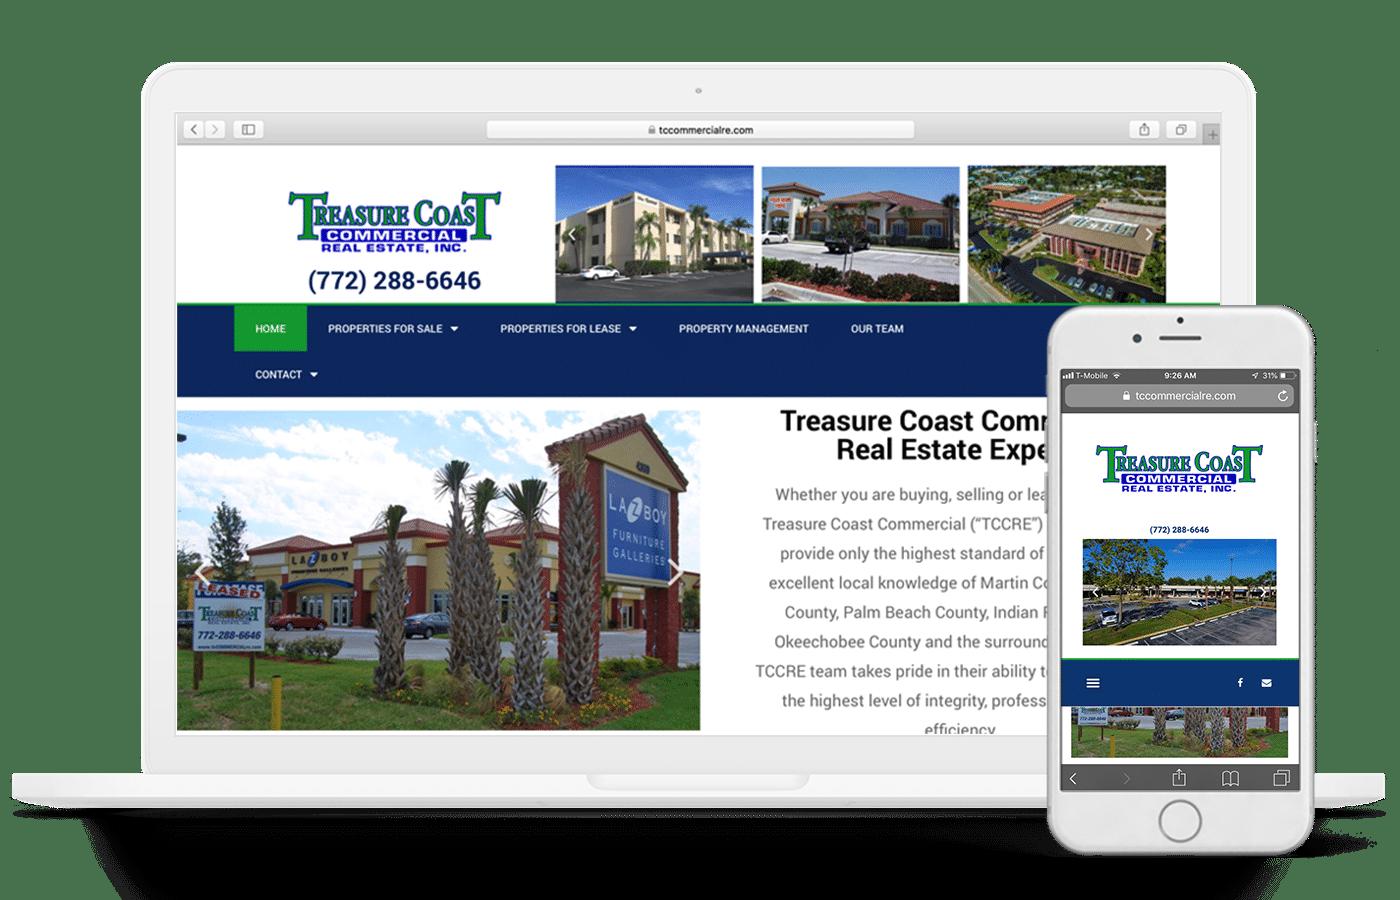 treasure coast commercial website design and marketing example